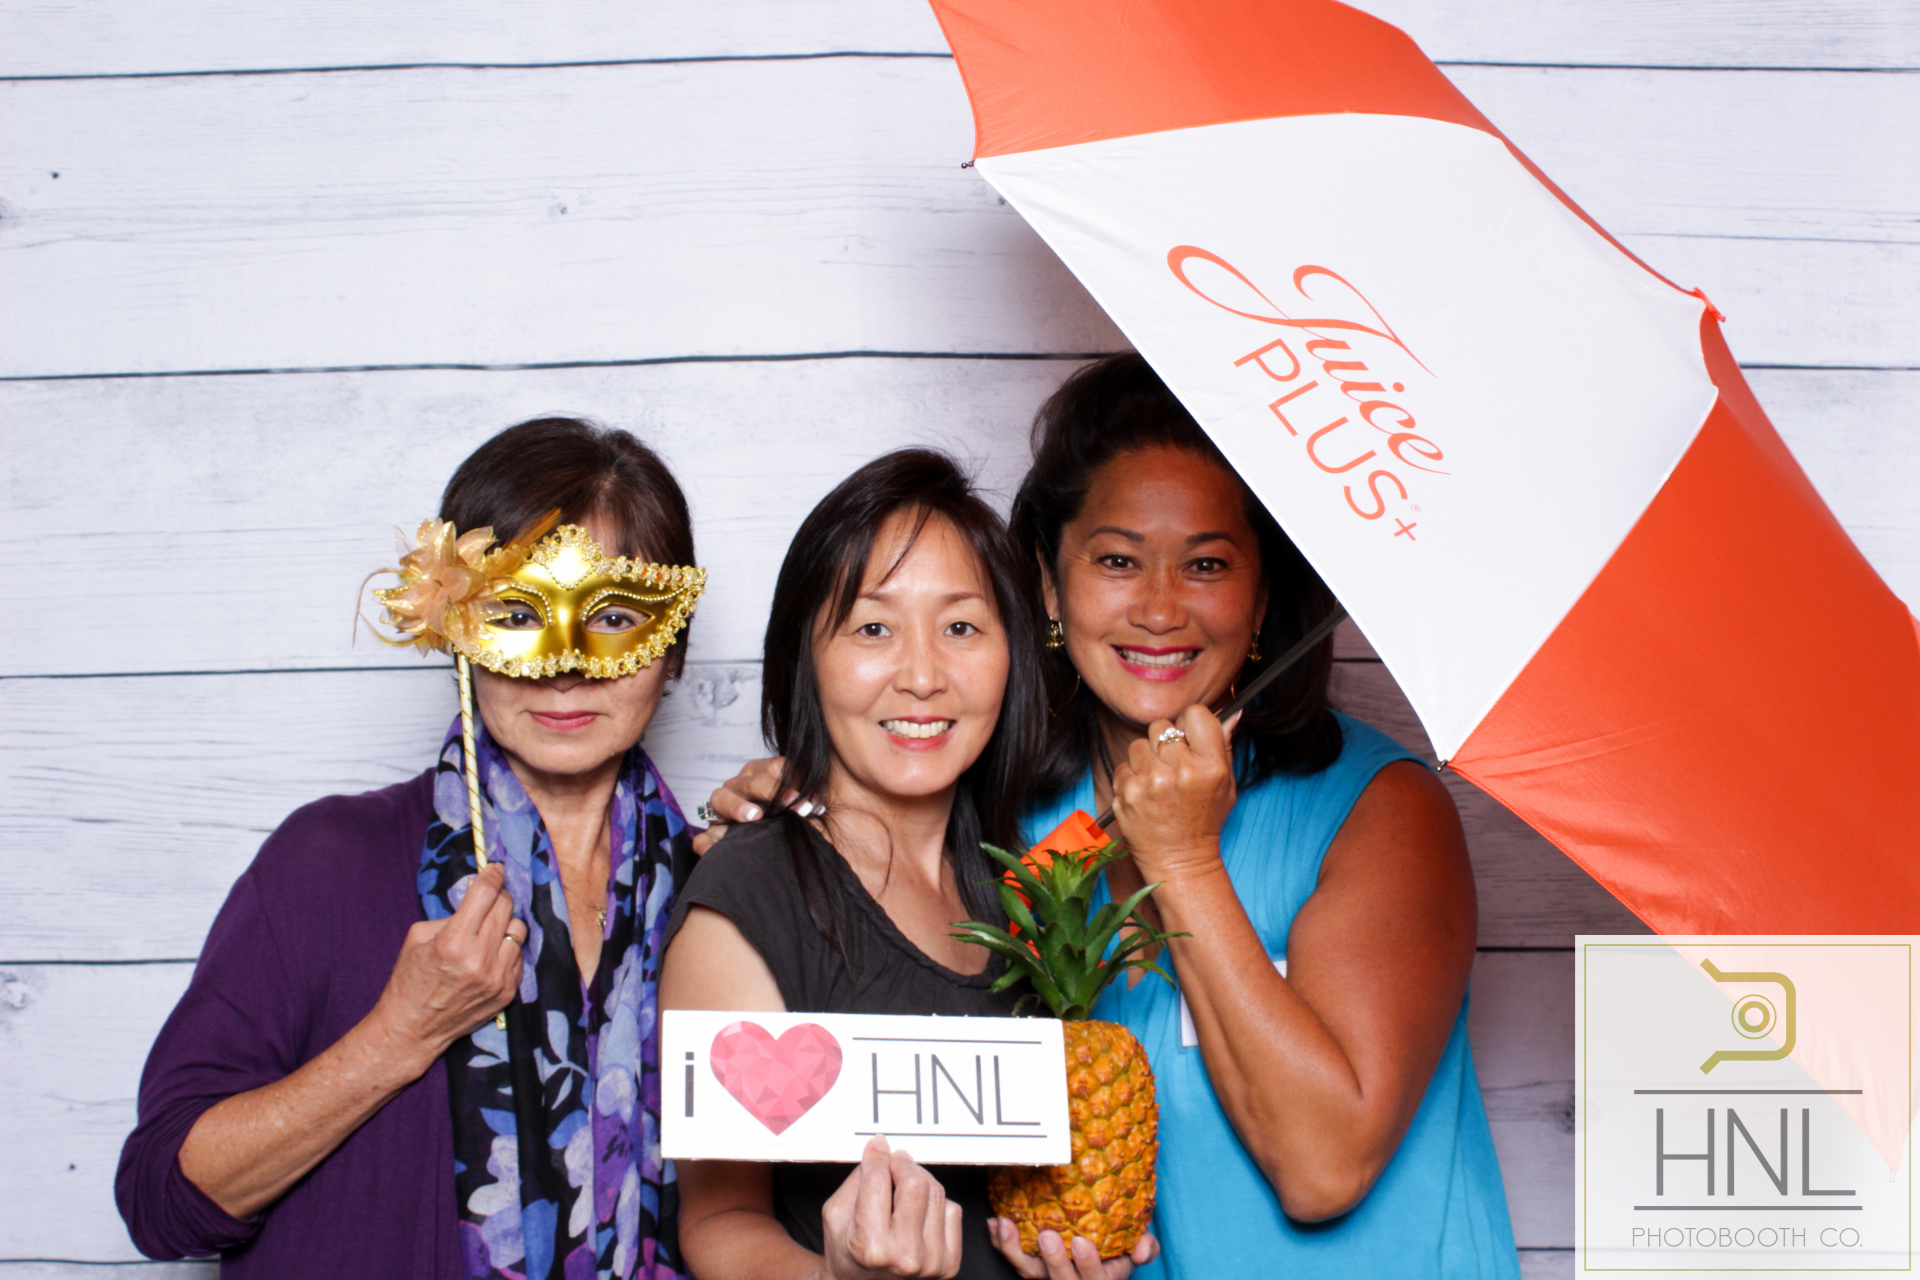 Hawaii honolulu aiea kapolei ewa kaneohe kailua photo booth rentals photography party event corporate wedding graduation birthday kakaako waikiki